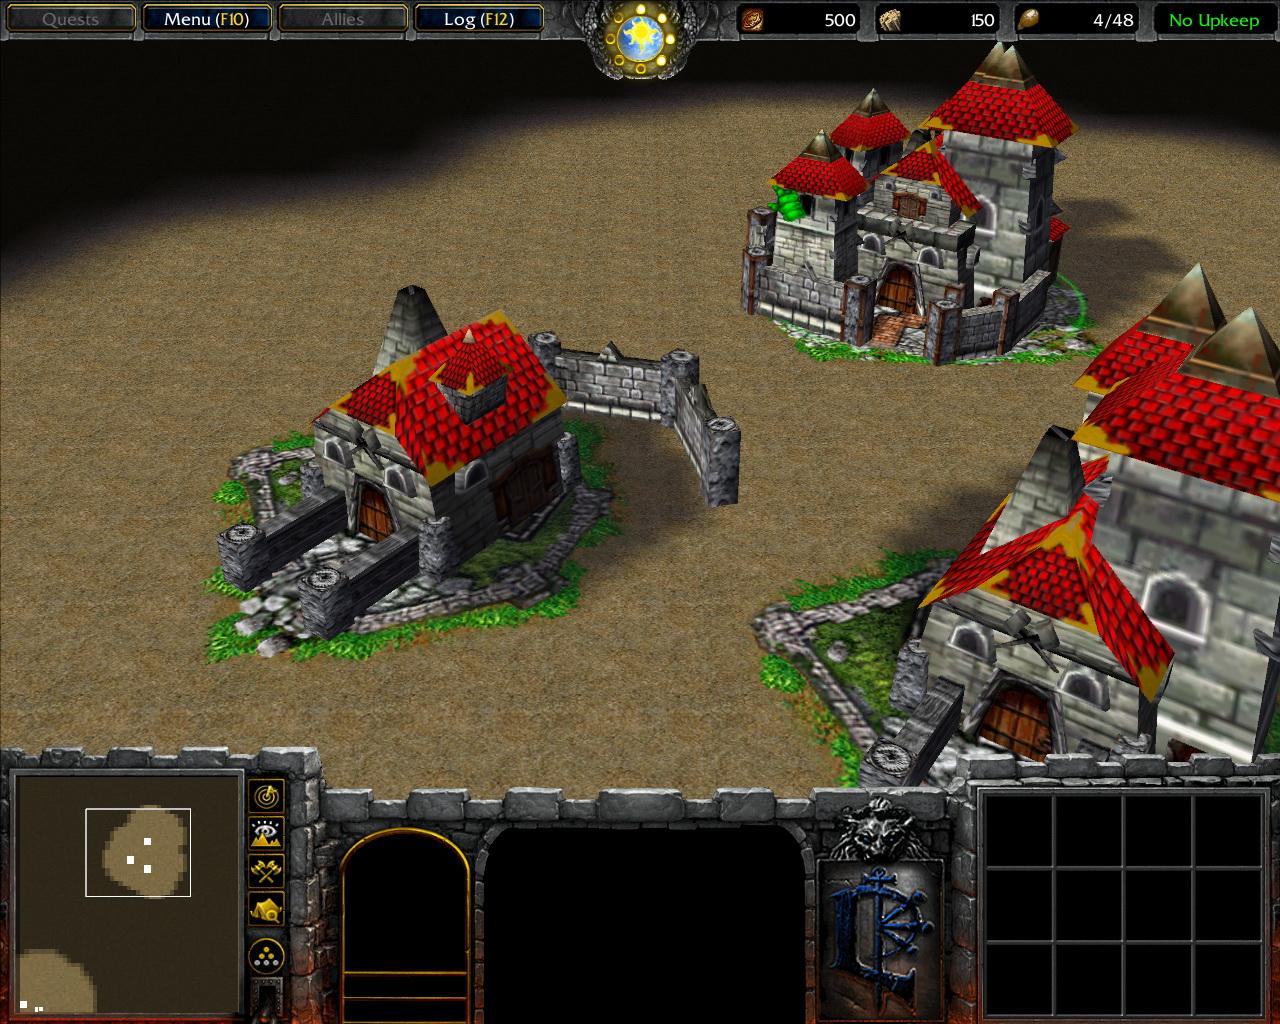 Human Townhall image - Warcraft Resurrection mod for